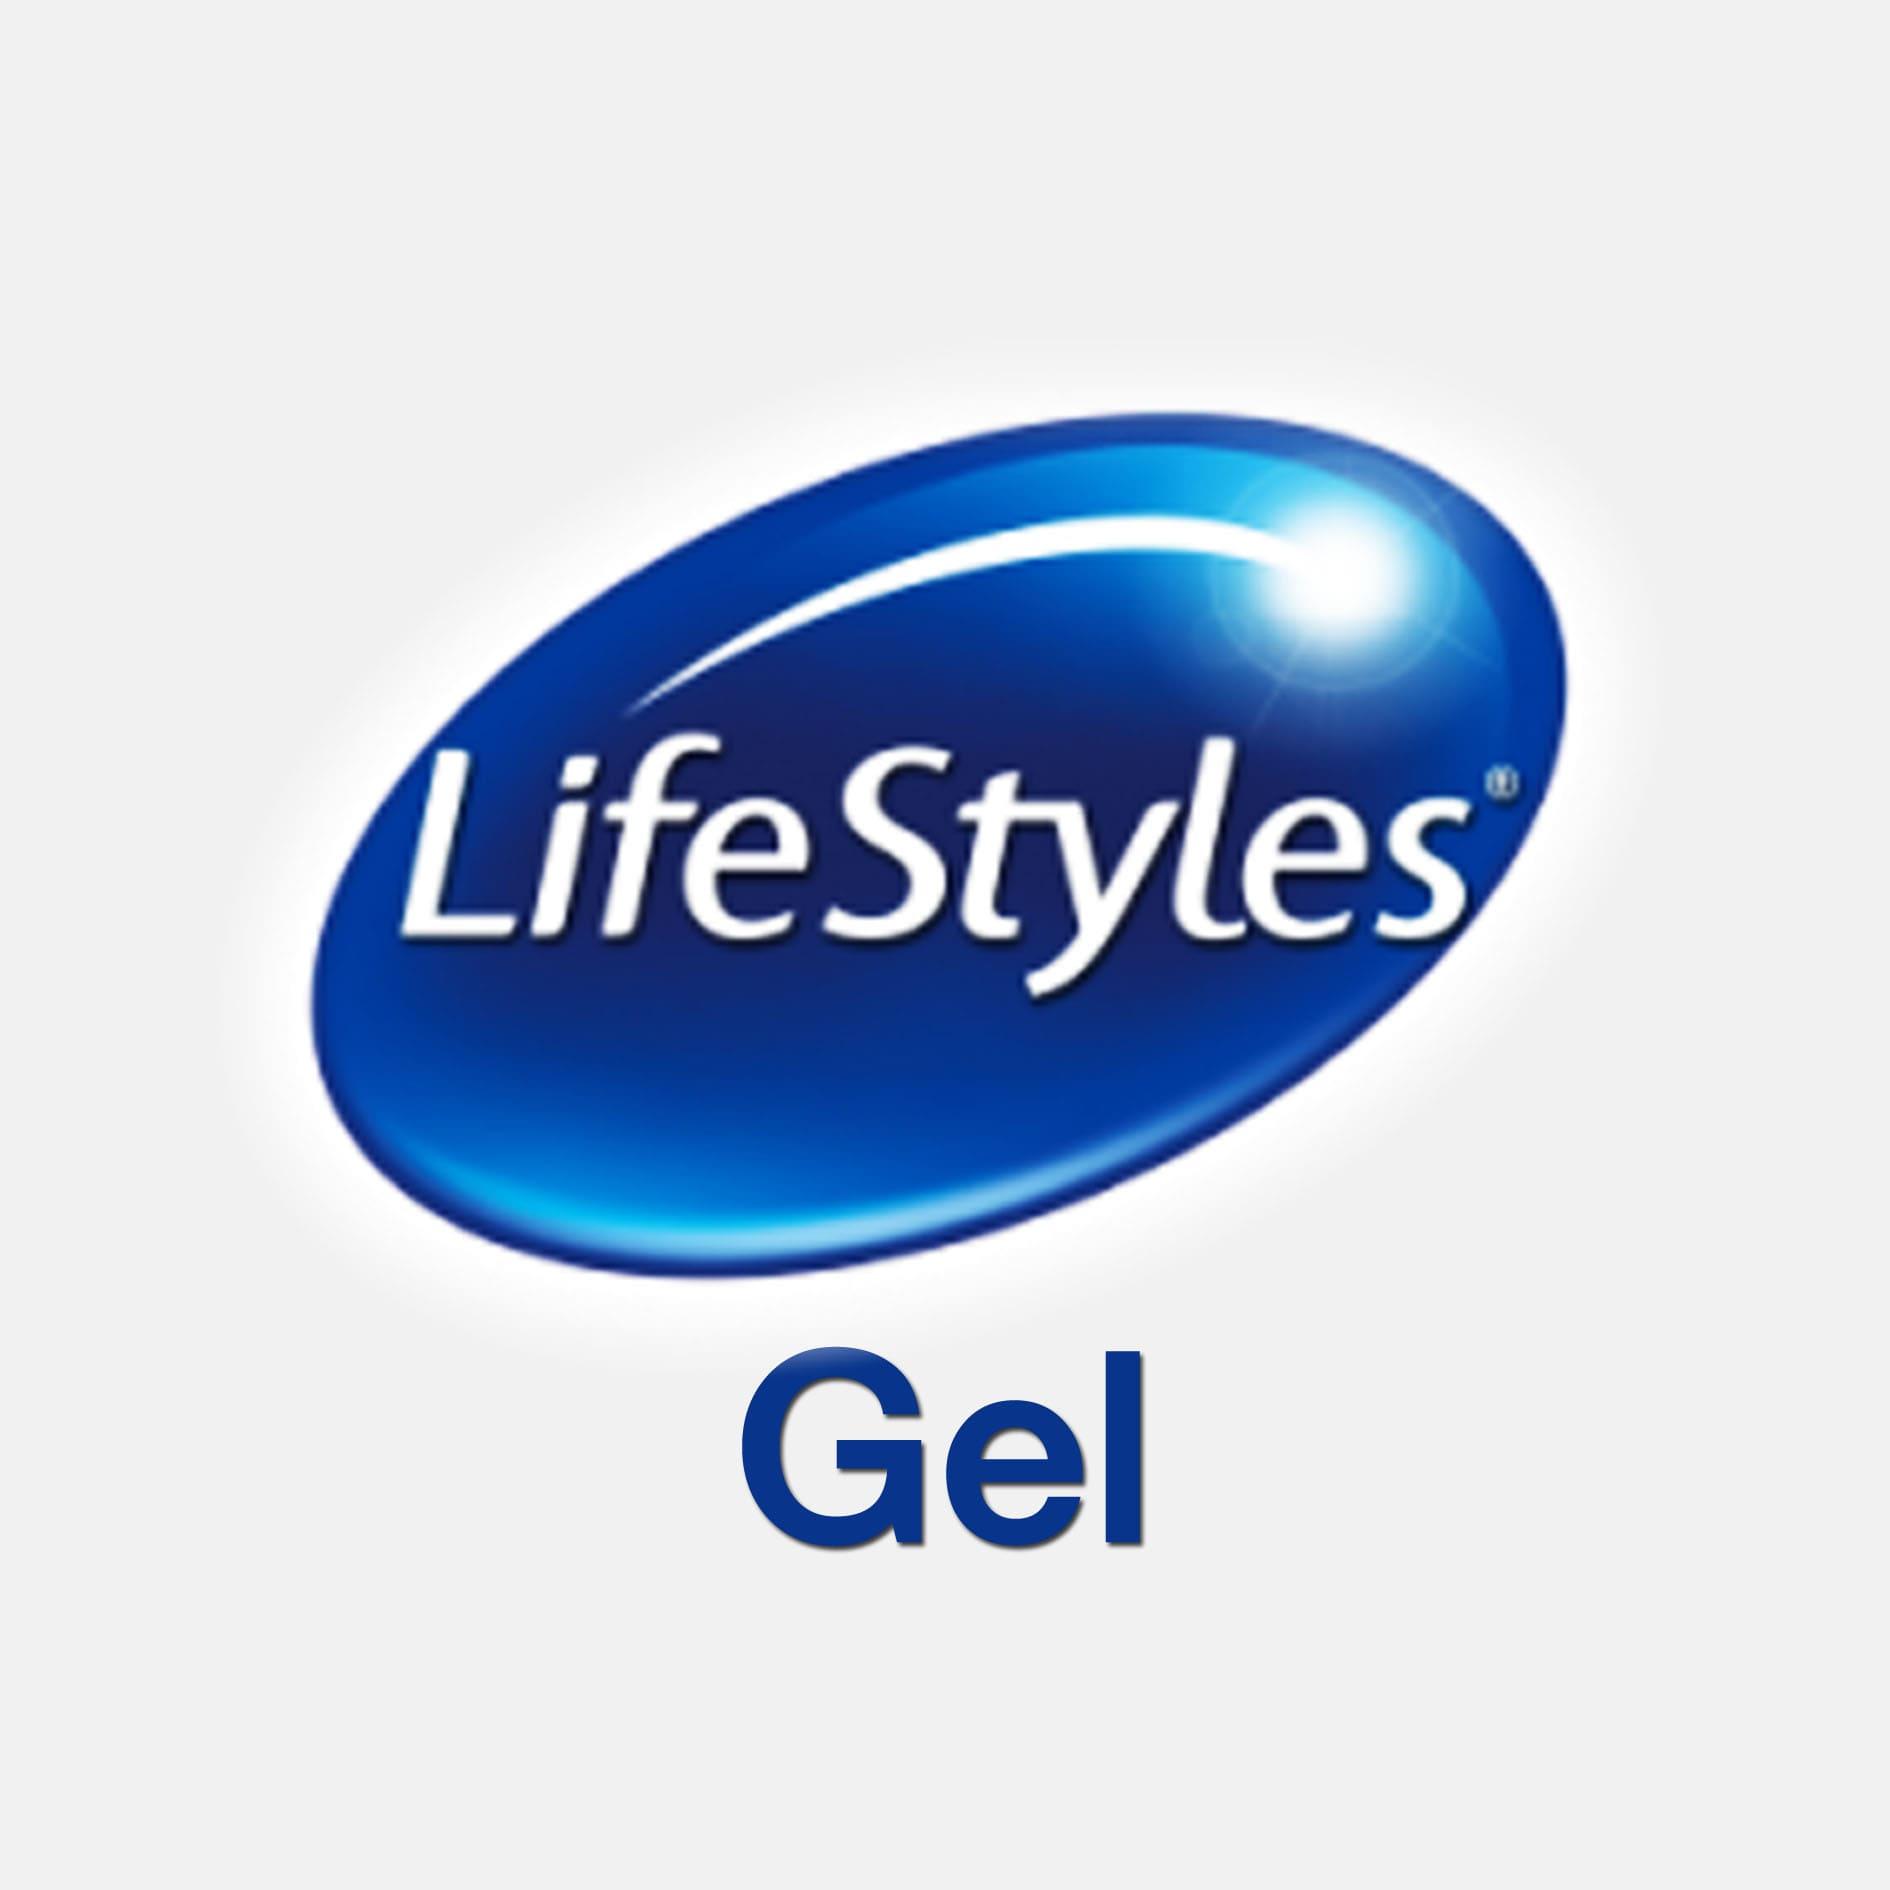 lifestyles gel